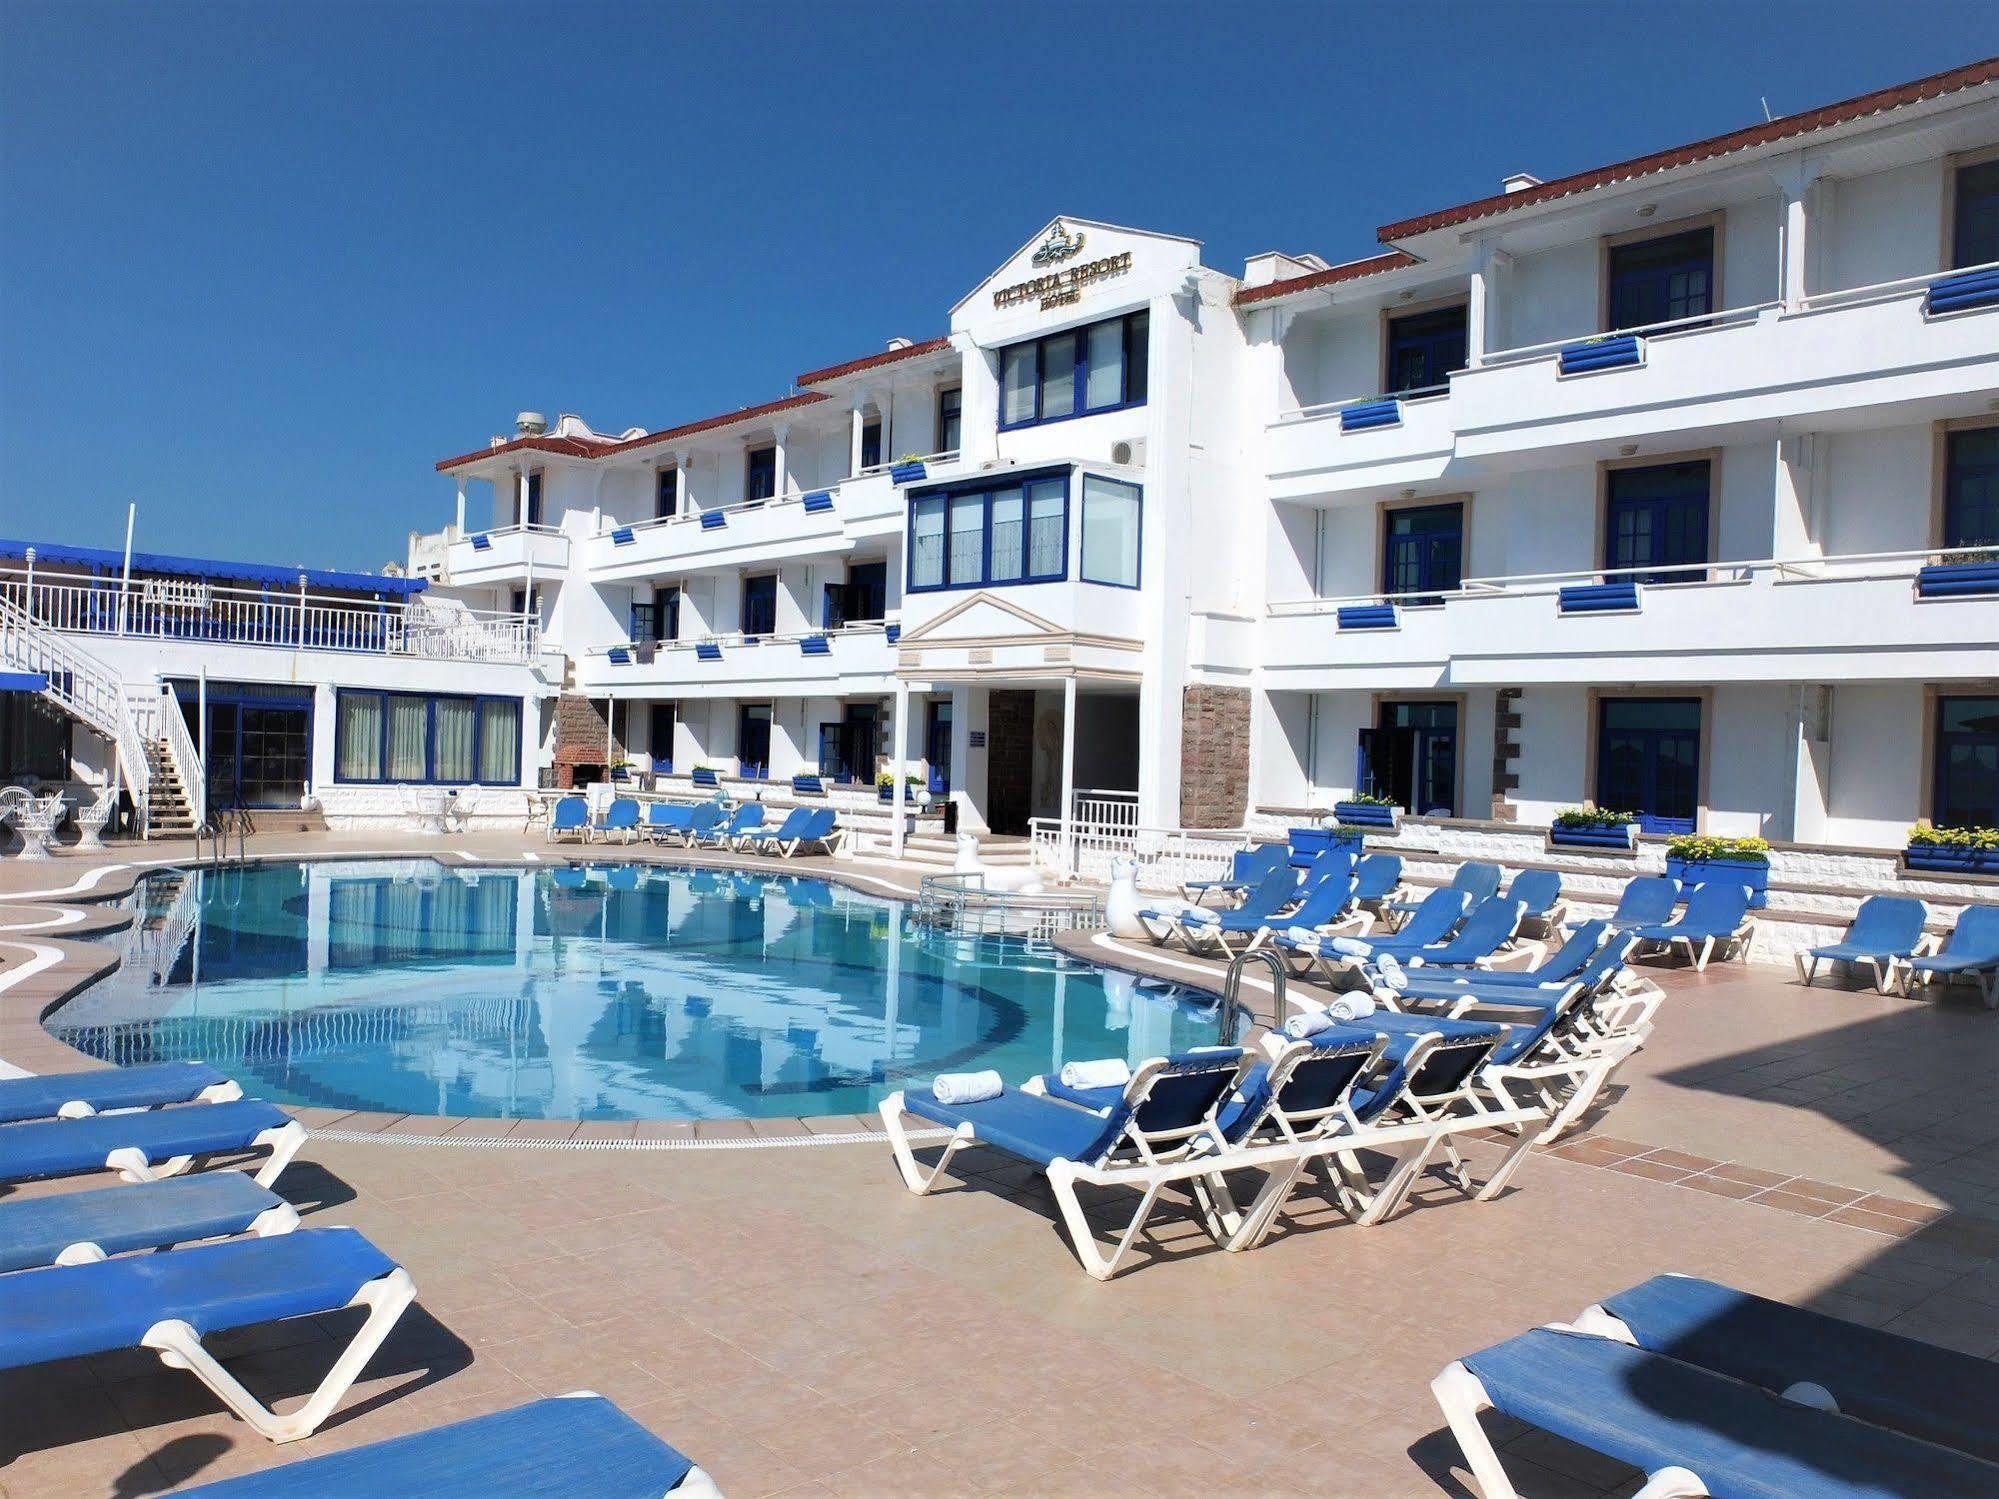 Victoria Suite Hotel & Spa Turgutreis dedans Piscine Petit Couronne